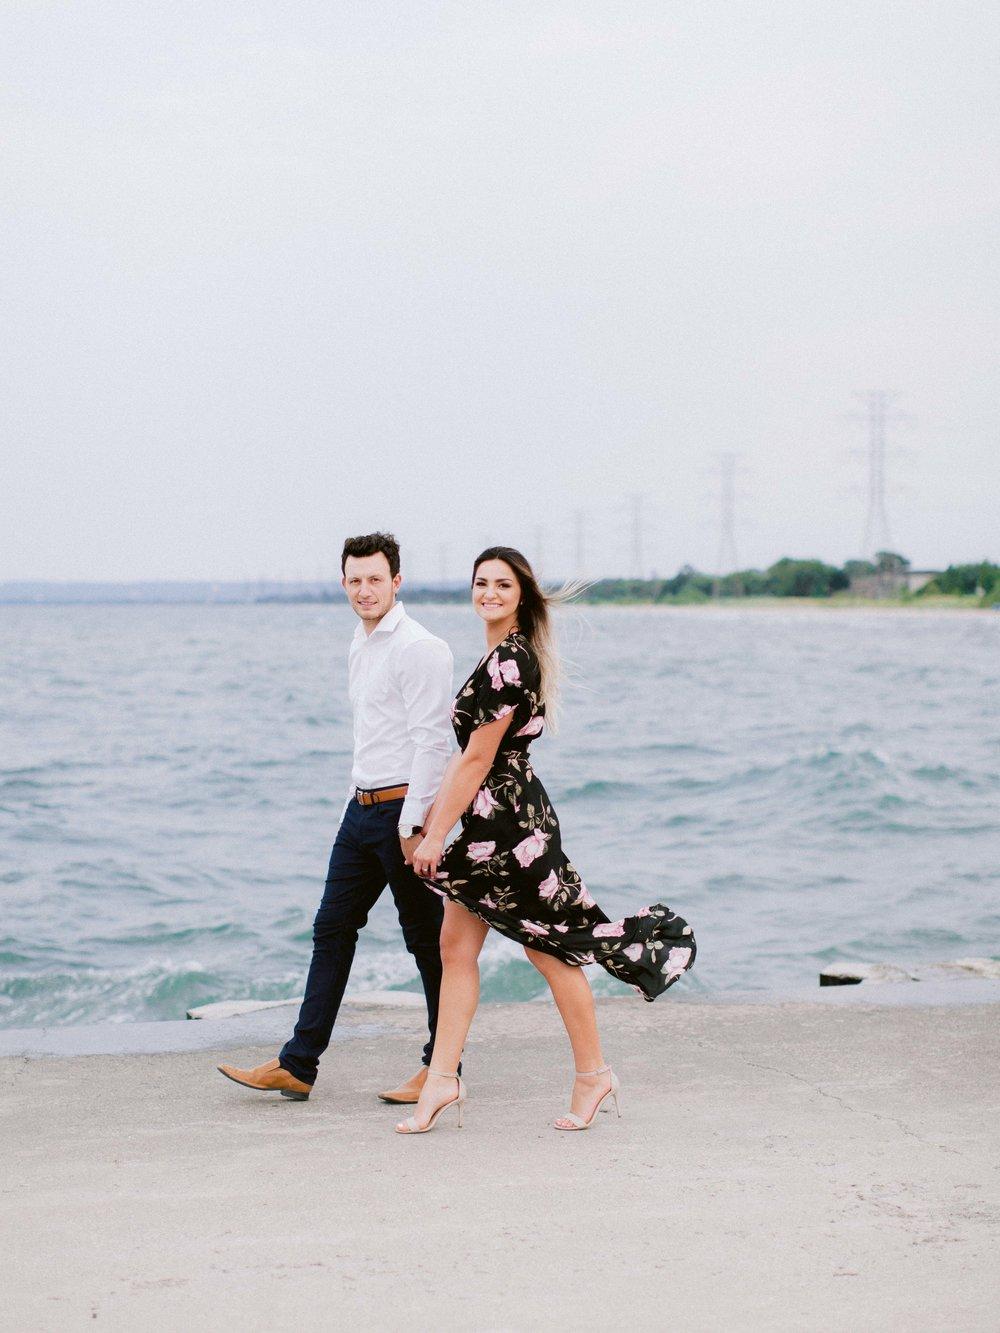 Summer_Engagament_Session_Toronto_Niagara_Wedding_Photographer (36 of 67).jpg